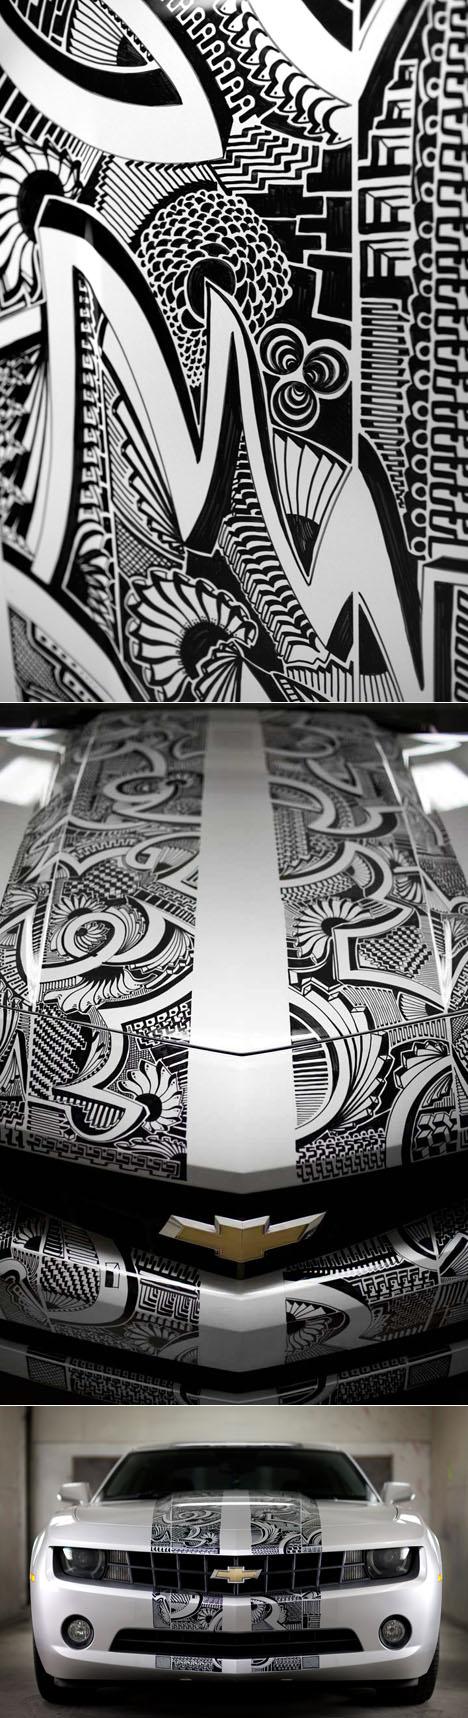 Arts Cars Sharpie_blogdesign_criatives (1)